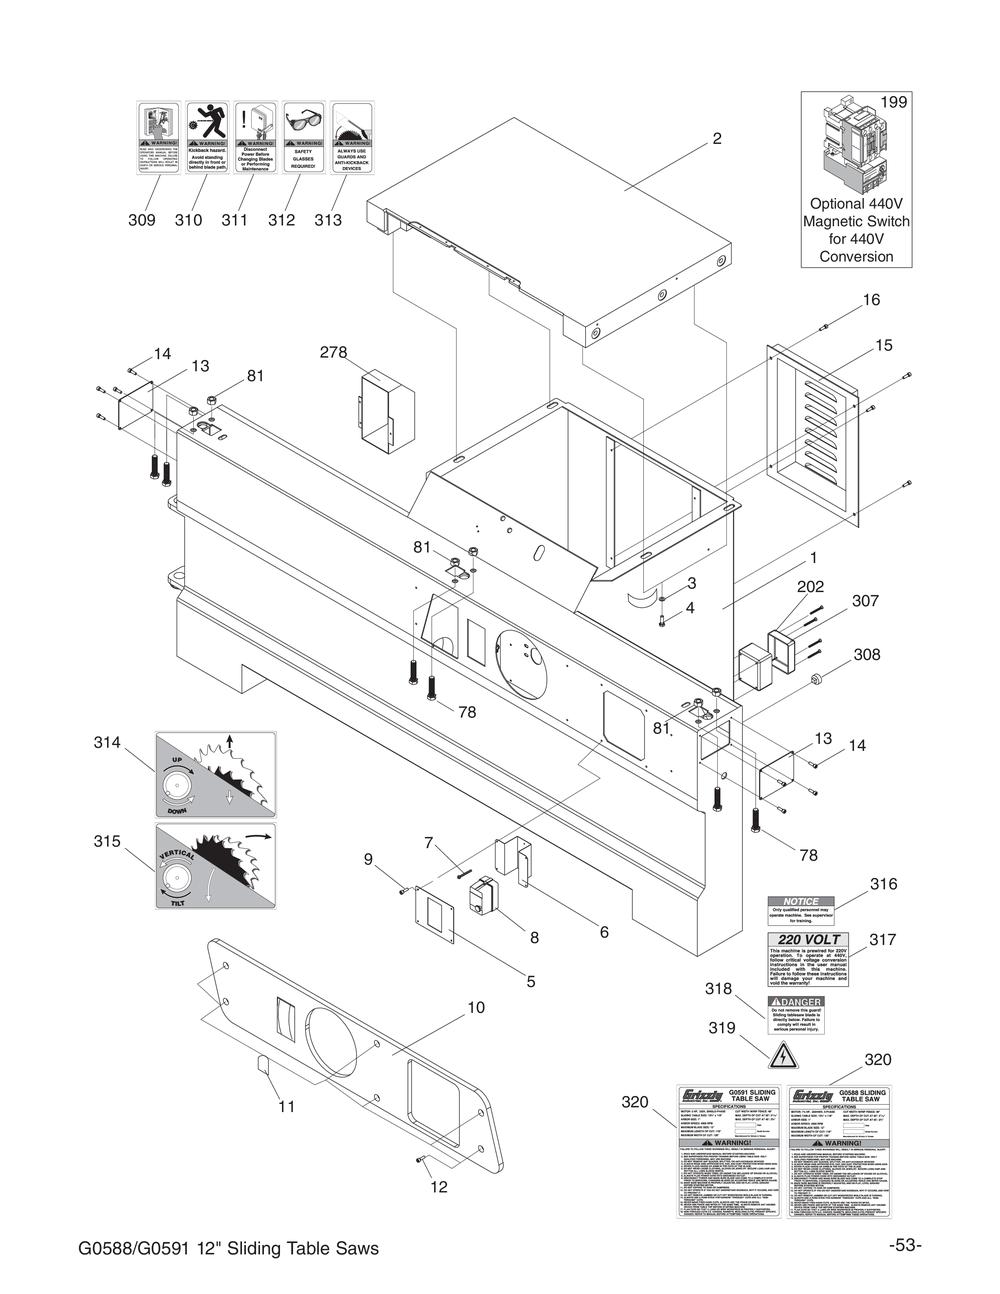 Table wiring saw diagram ks48yzek198 dw744 type 6 wiring diagram dw744 table saw wiring diagram greentooth Gallery